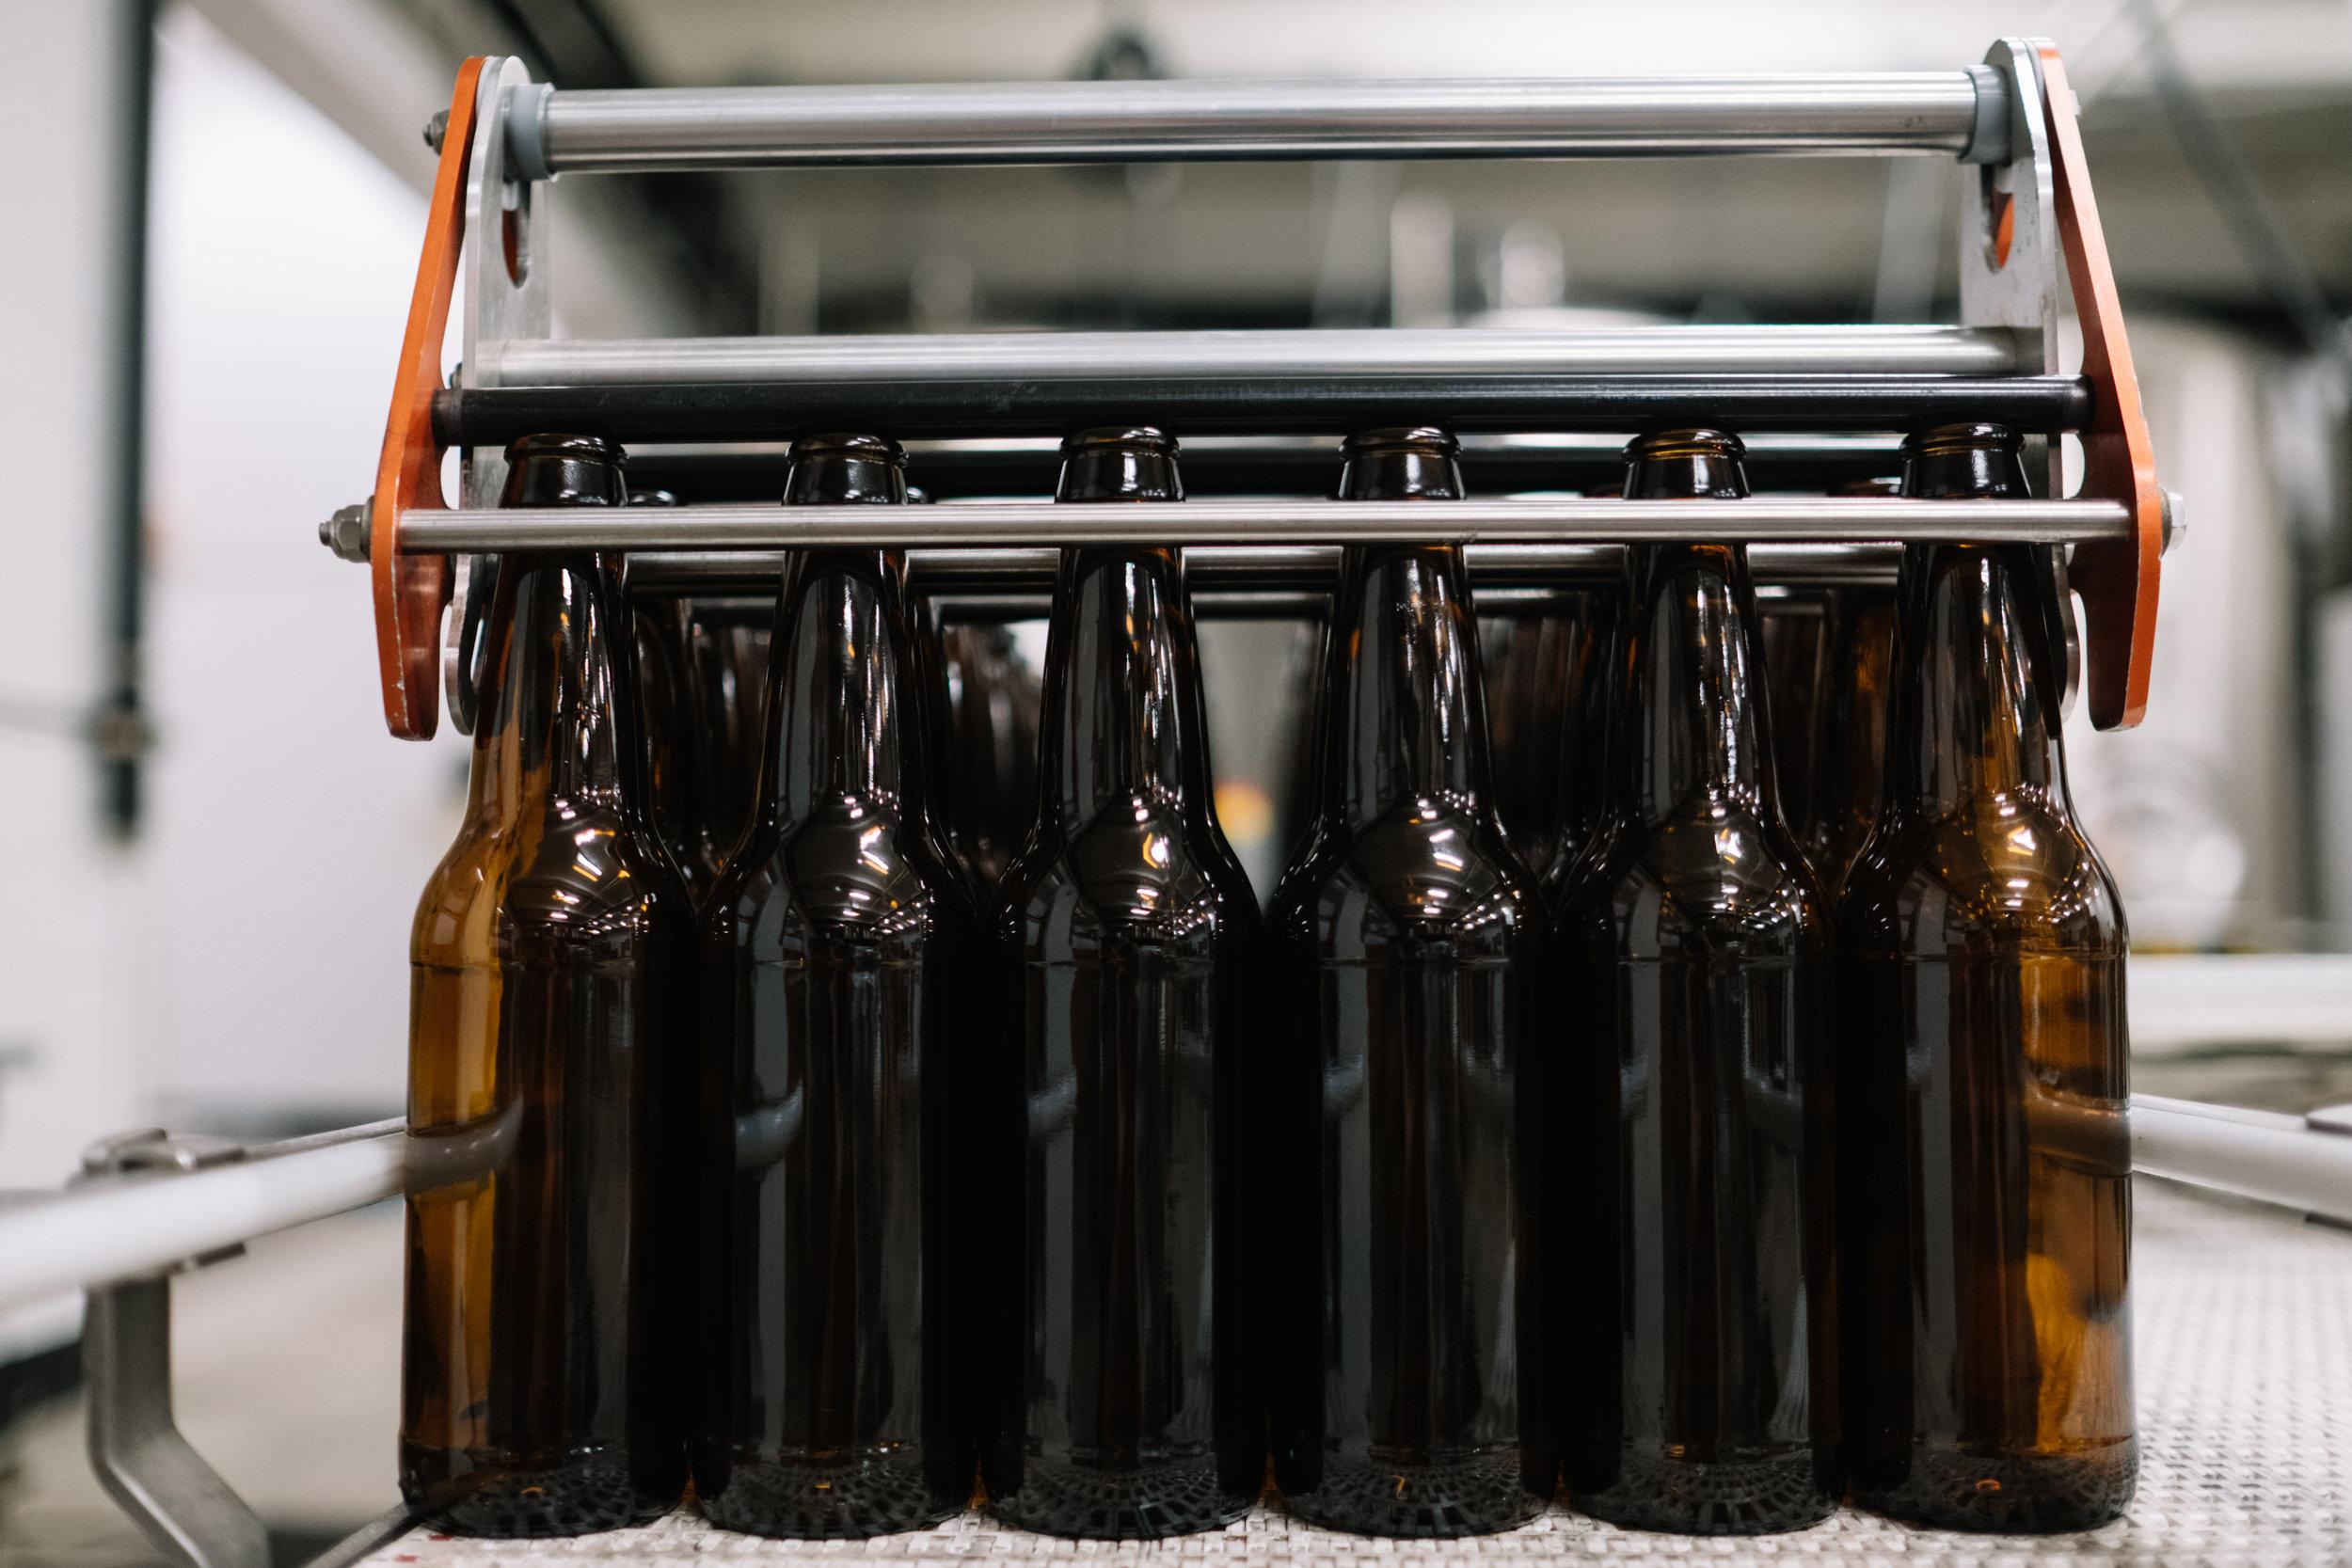 Copy of Bottles of beer